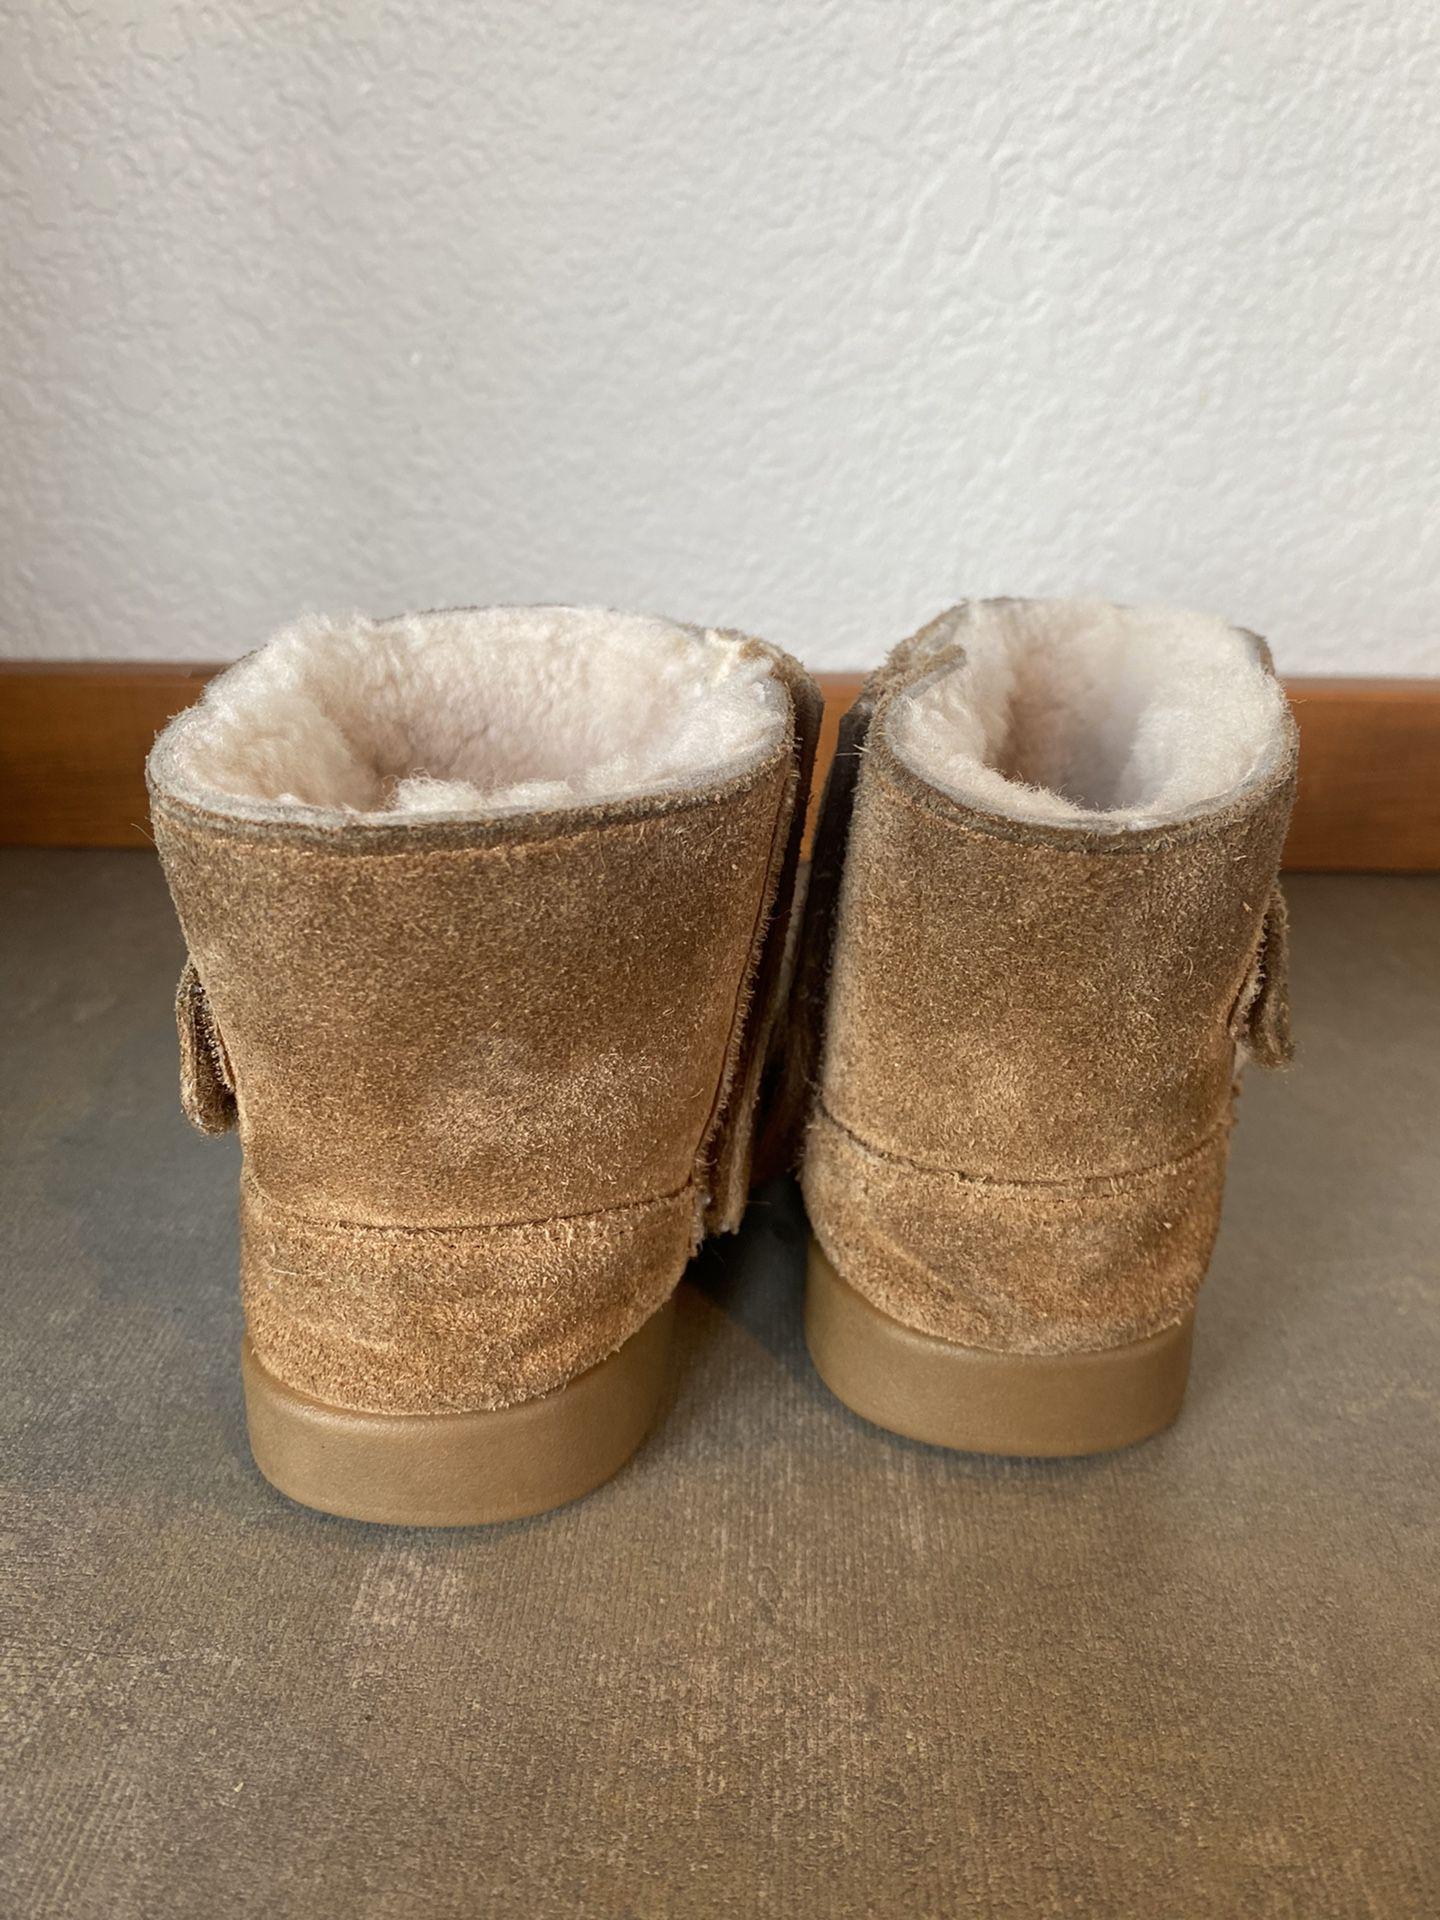 Keelan Baby Ugg Boots USA 4/5